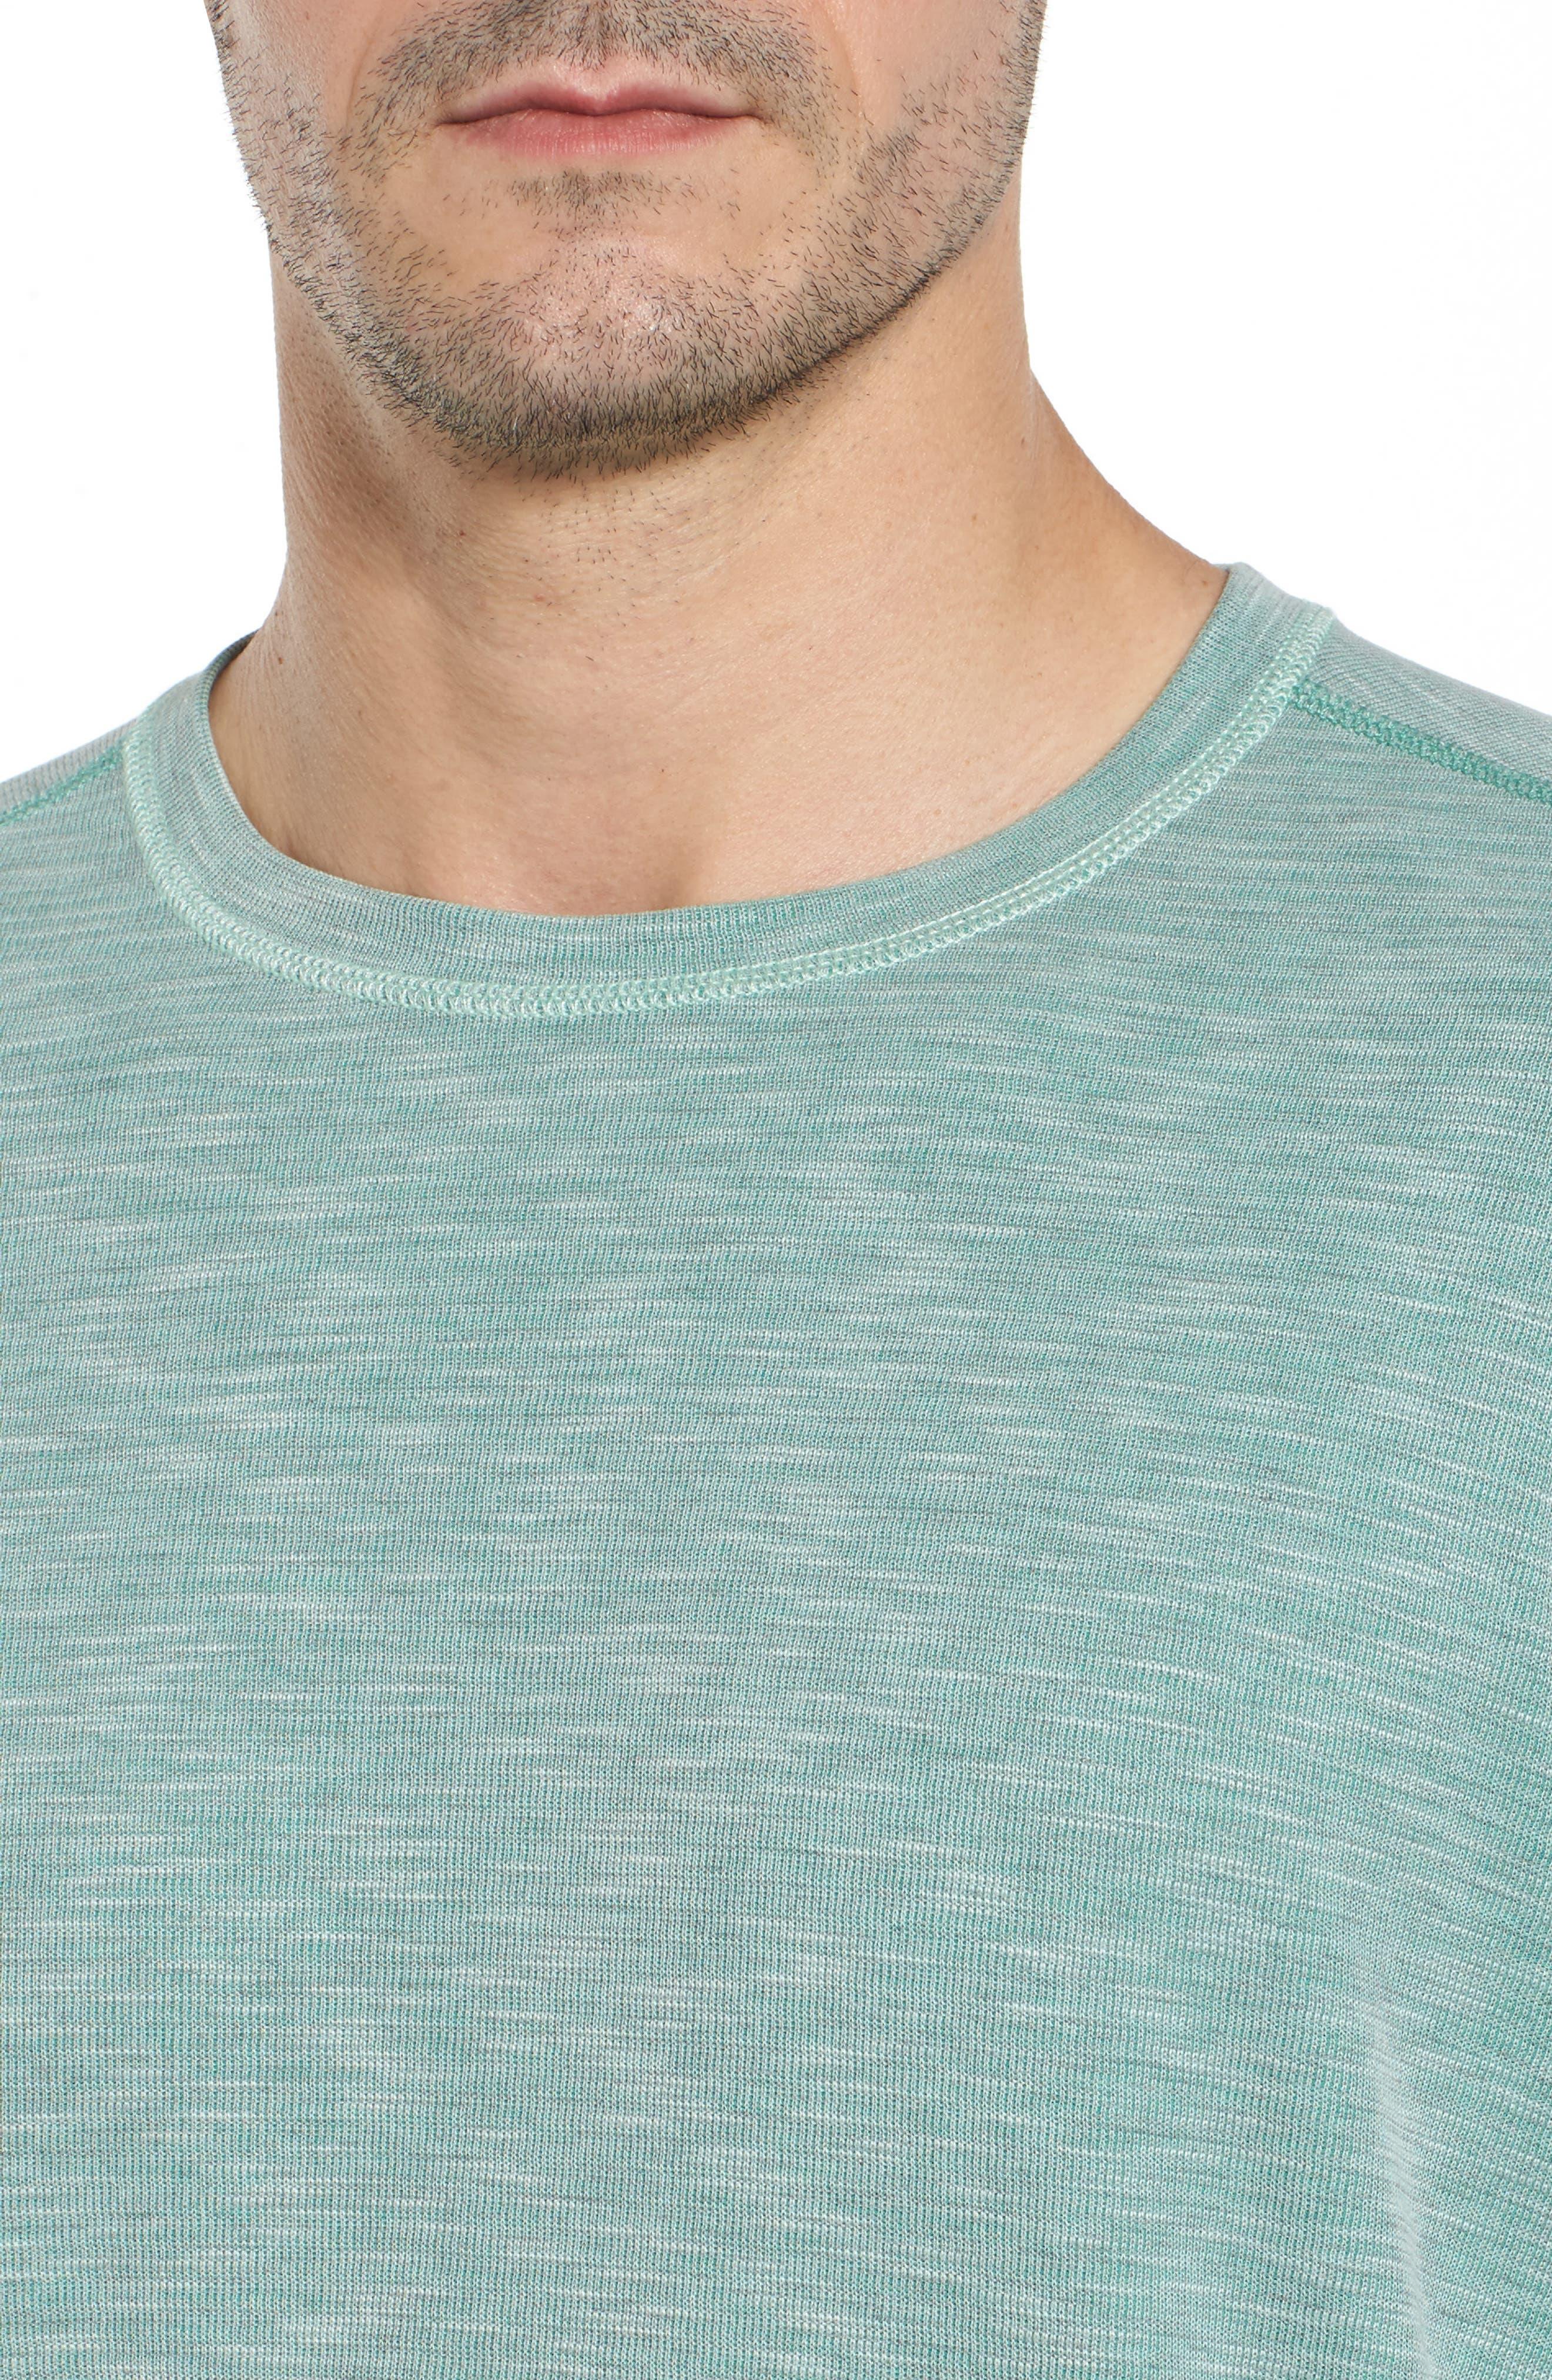 Flip Tide T-Shirt,                             Alternate thumbnail 35, color,